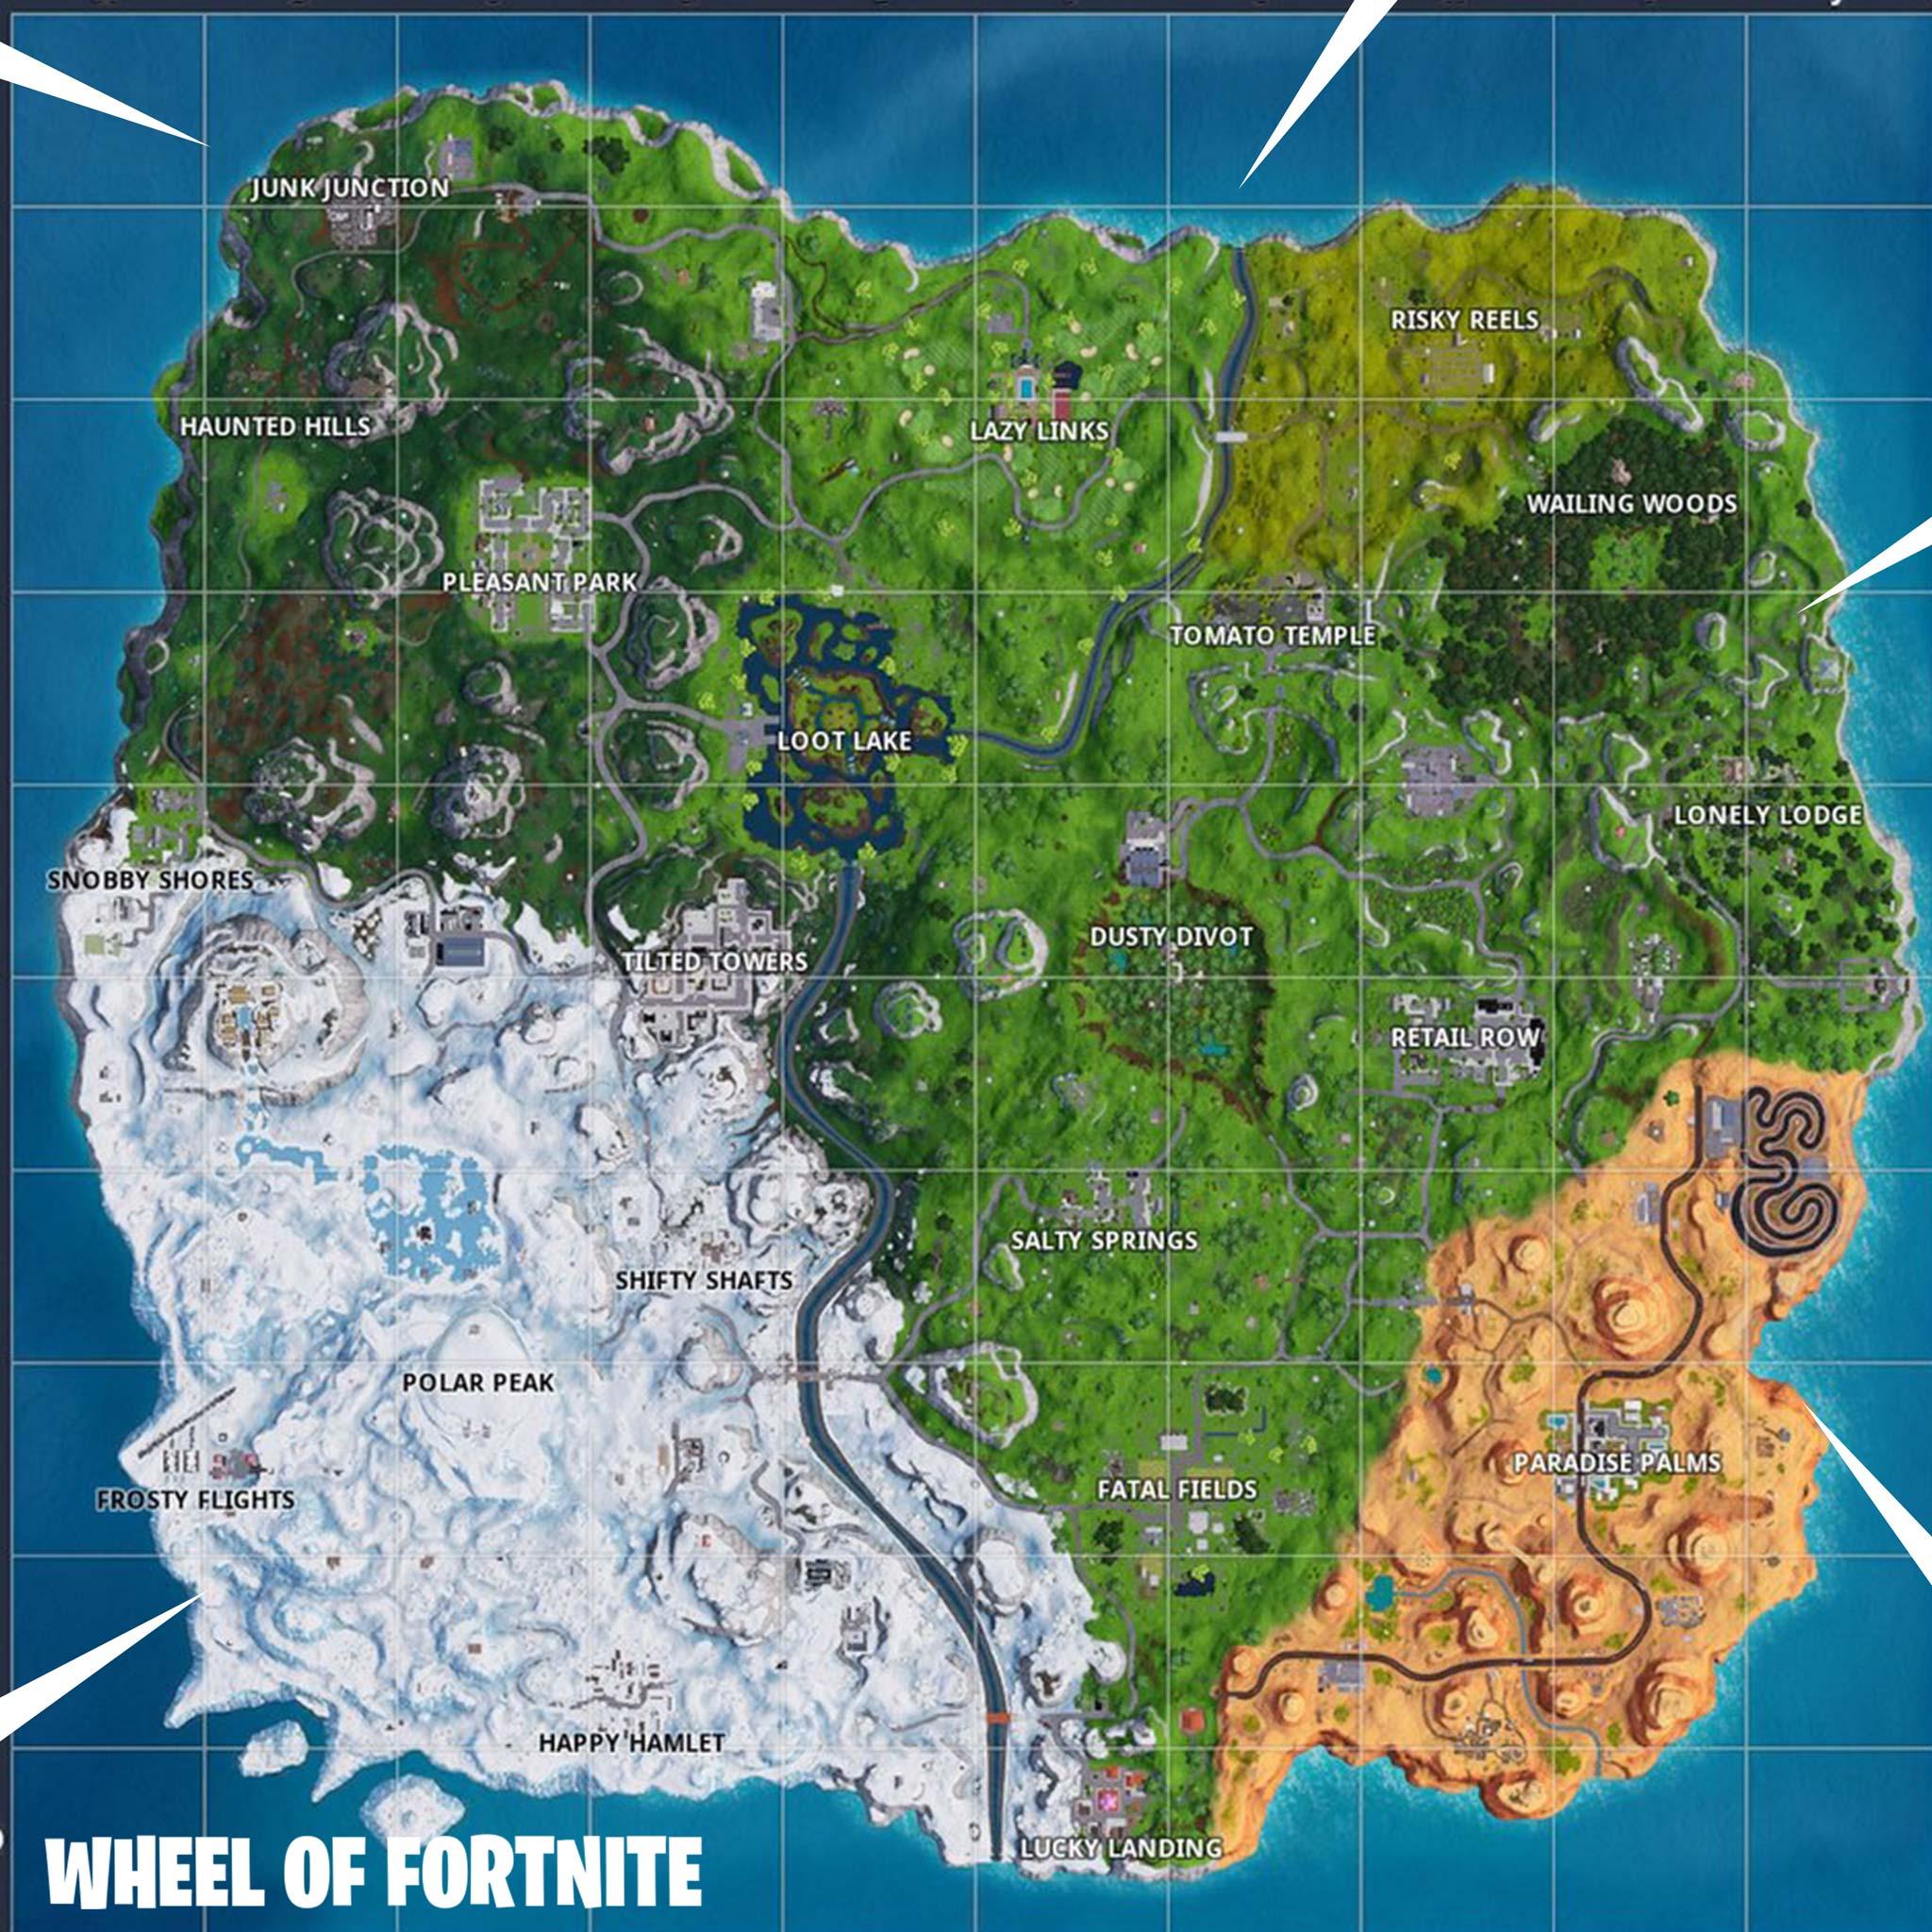 wof-fortnite-map-season-7